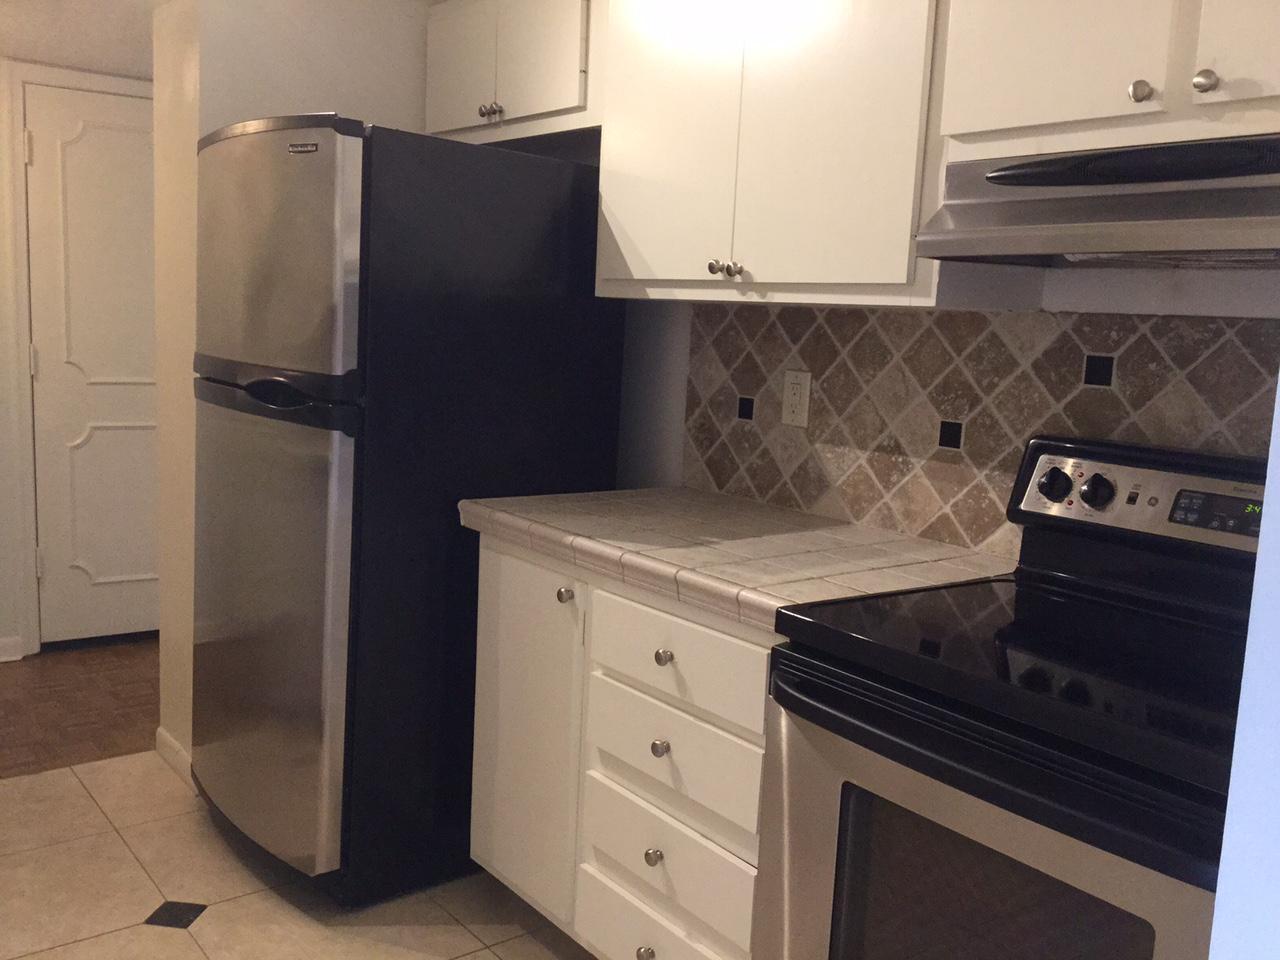 950 Ponce De Leon Road 410, Boca Raton, Florida 33432, 2 Bedrooms Bedrooms, ,2 BathroomsBathrooms,F,Condominium,Ponce De Leon,RX-10524290